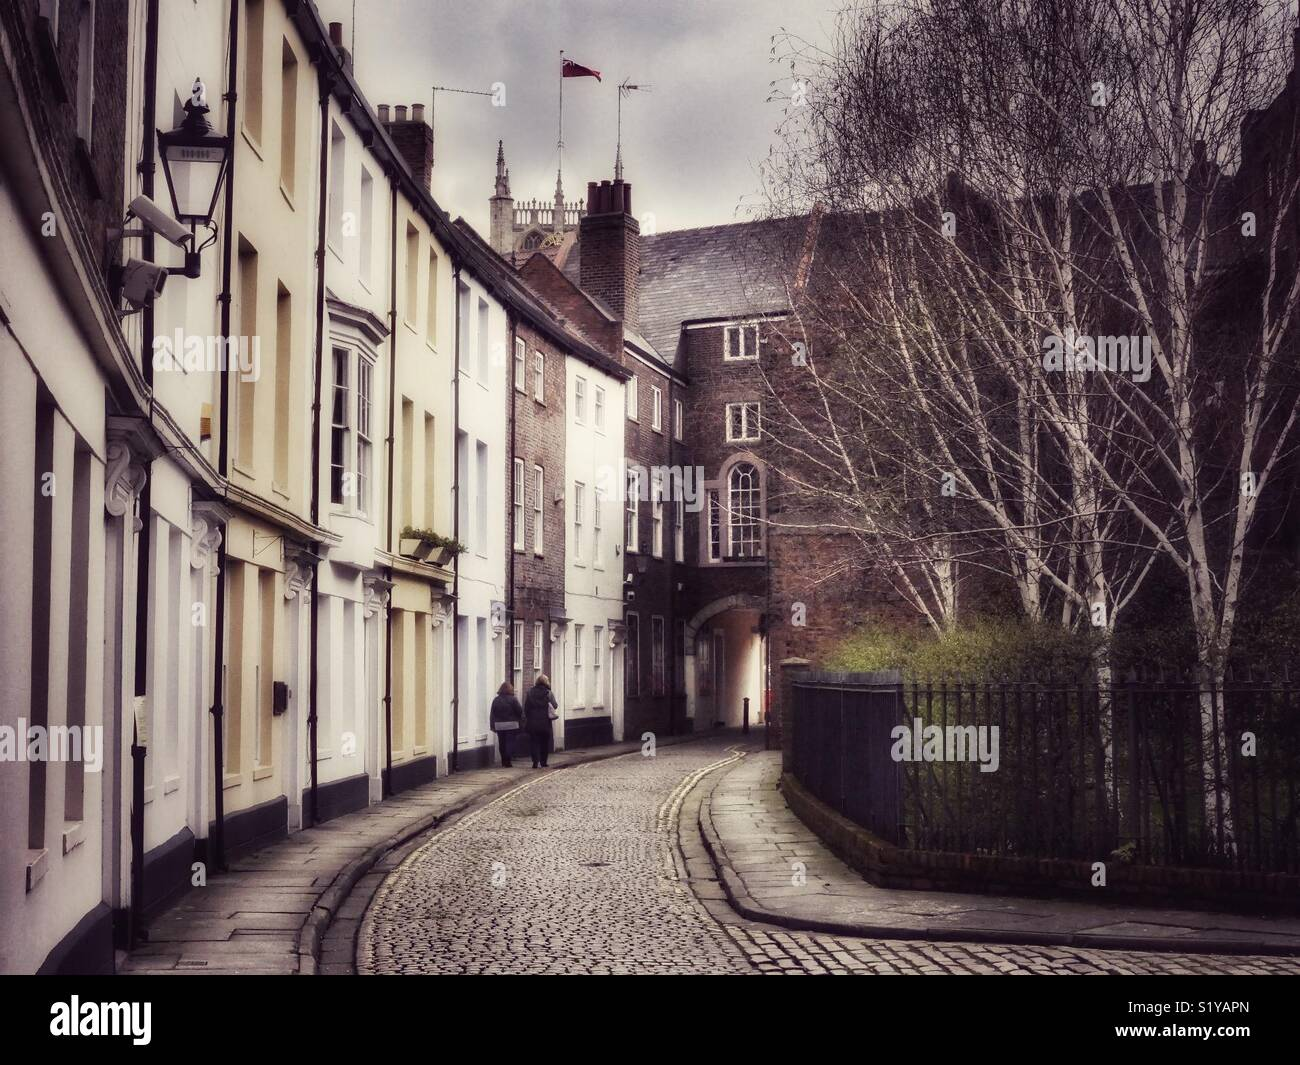 Prince Street, old town, Kingston-upon-Hull, England, UK Stock Photo